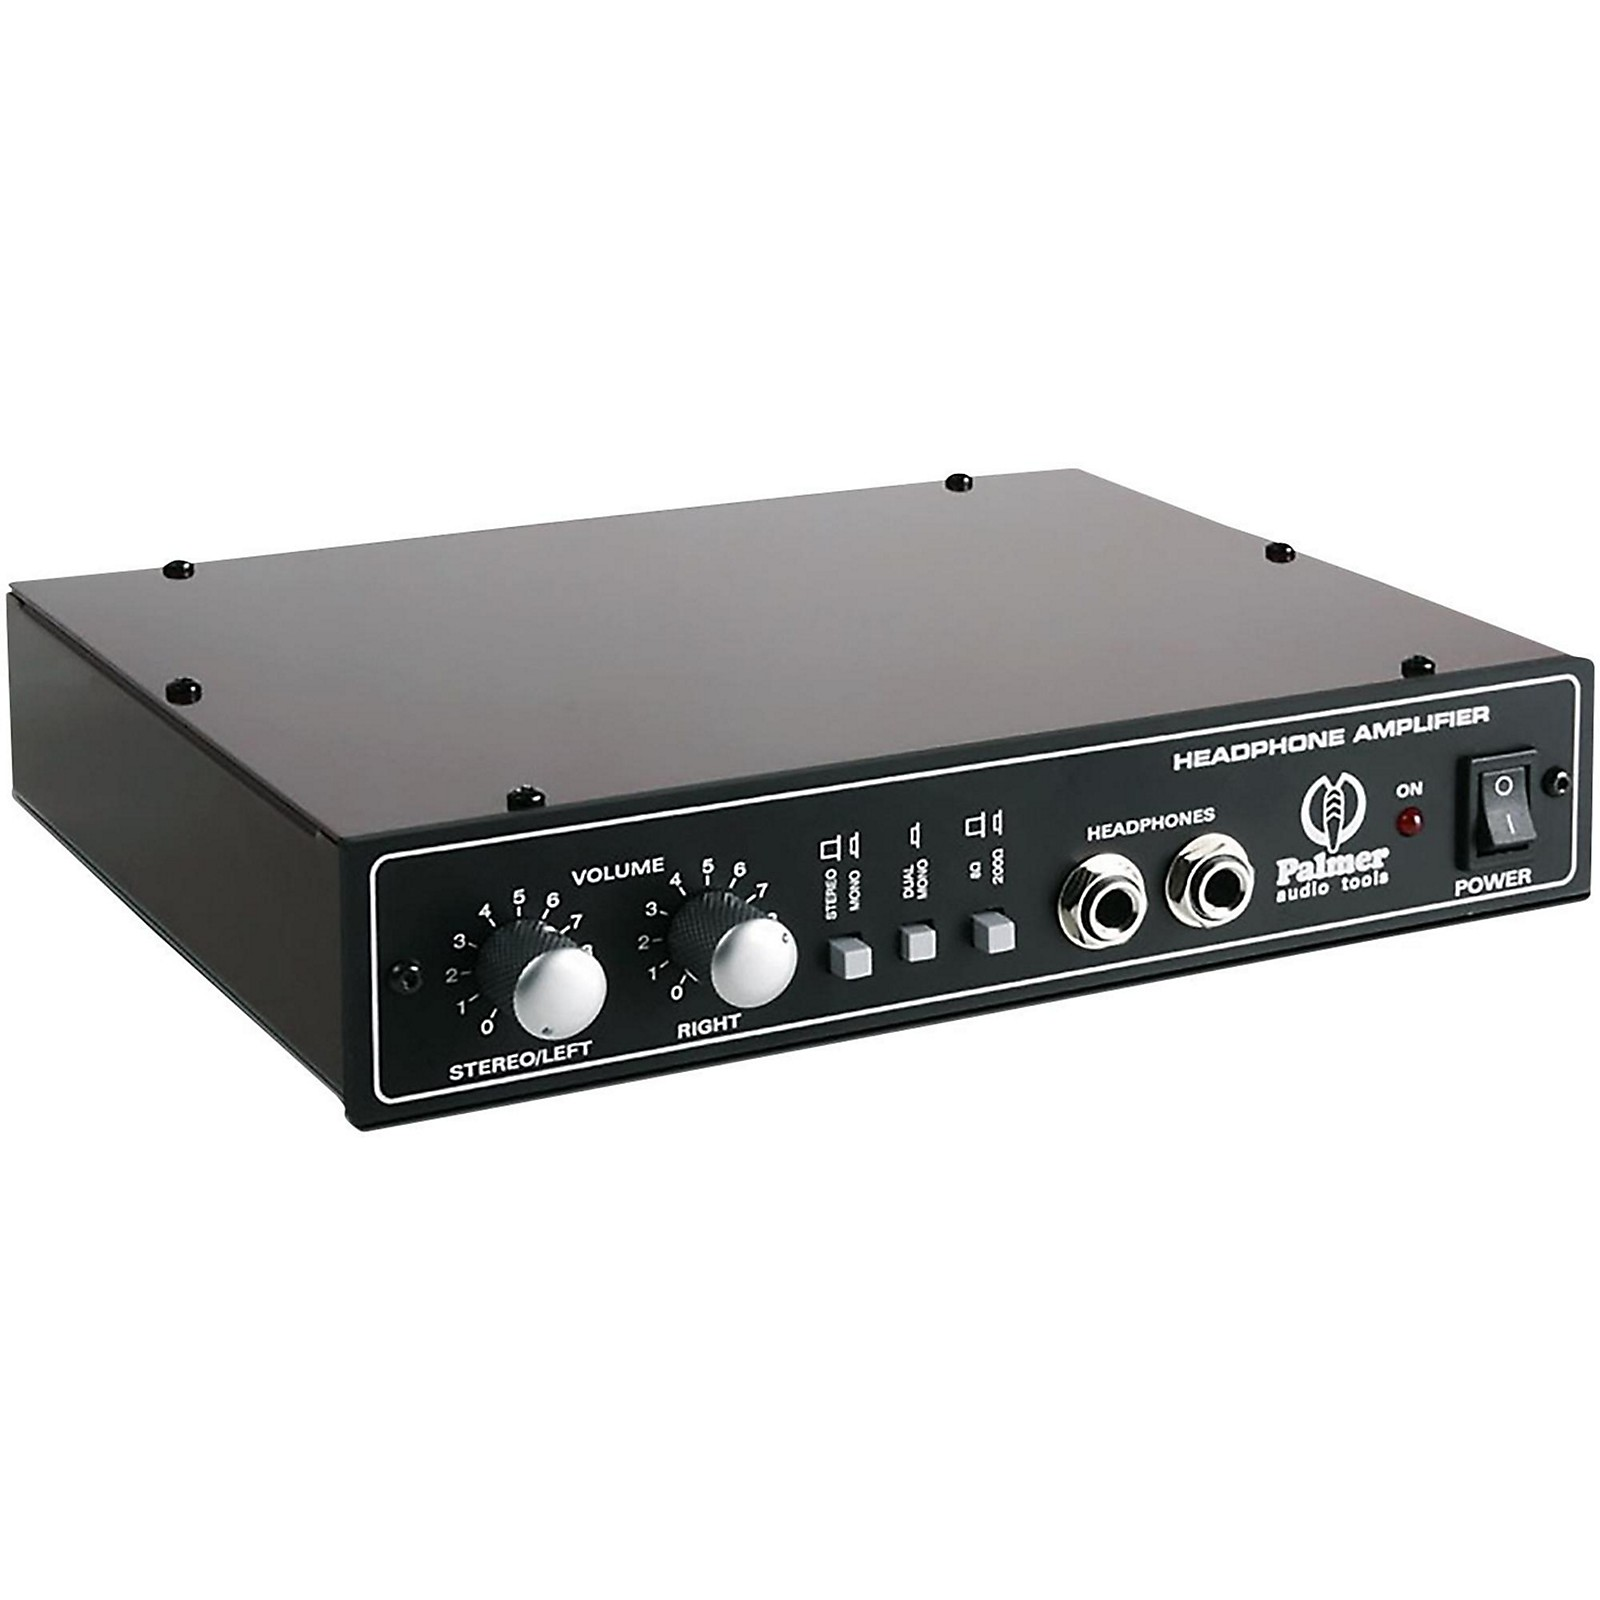 Palmer Audio Palmer Audio PHDA 02 Reference Class Headphone Amplifier - 1-channel